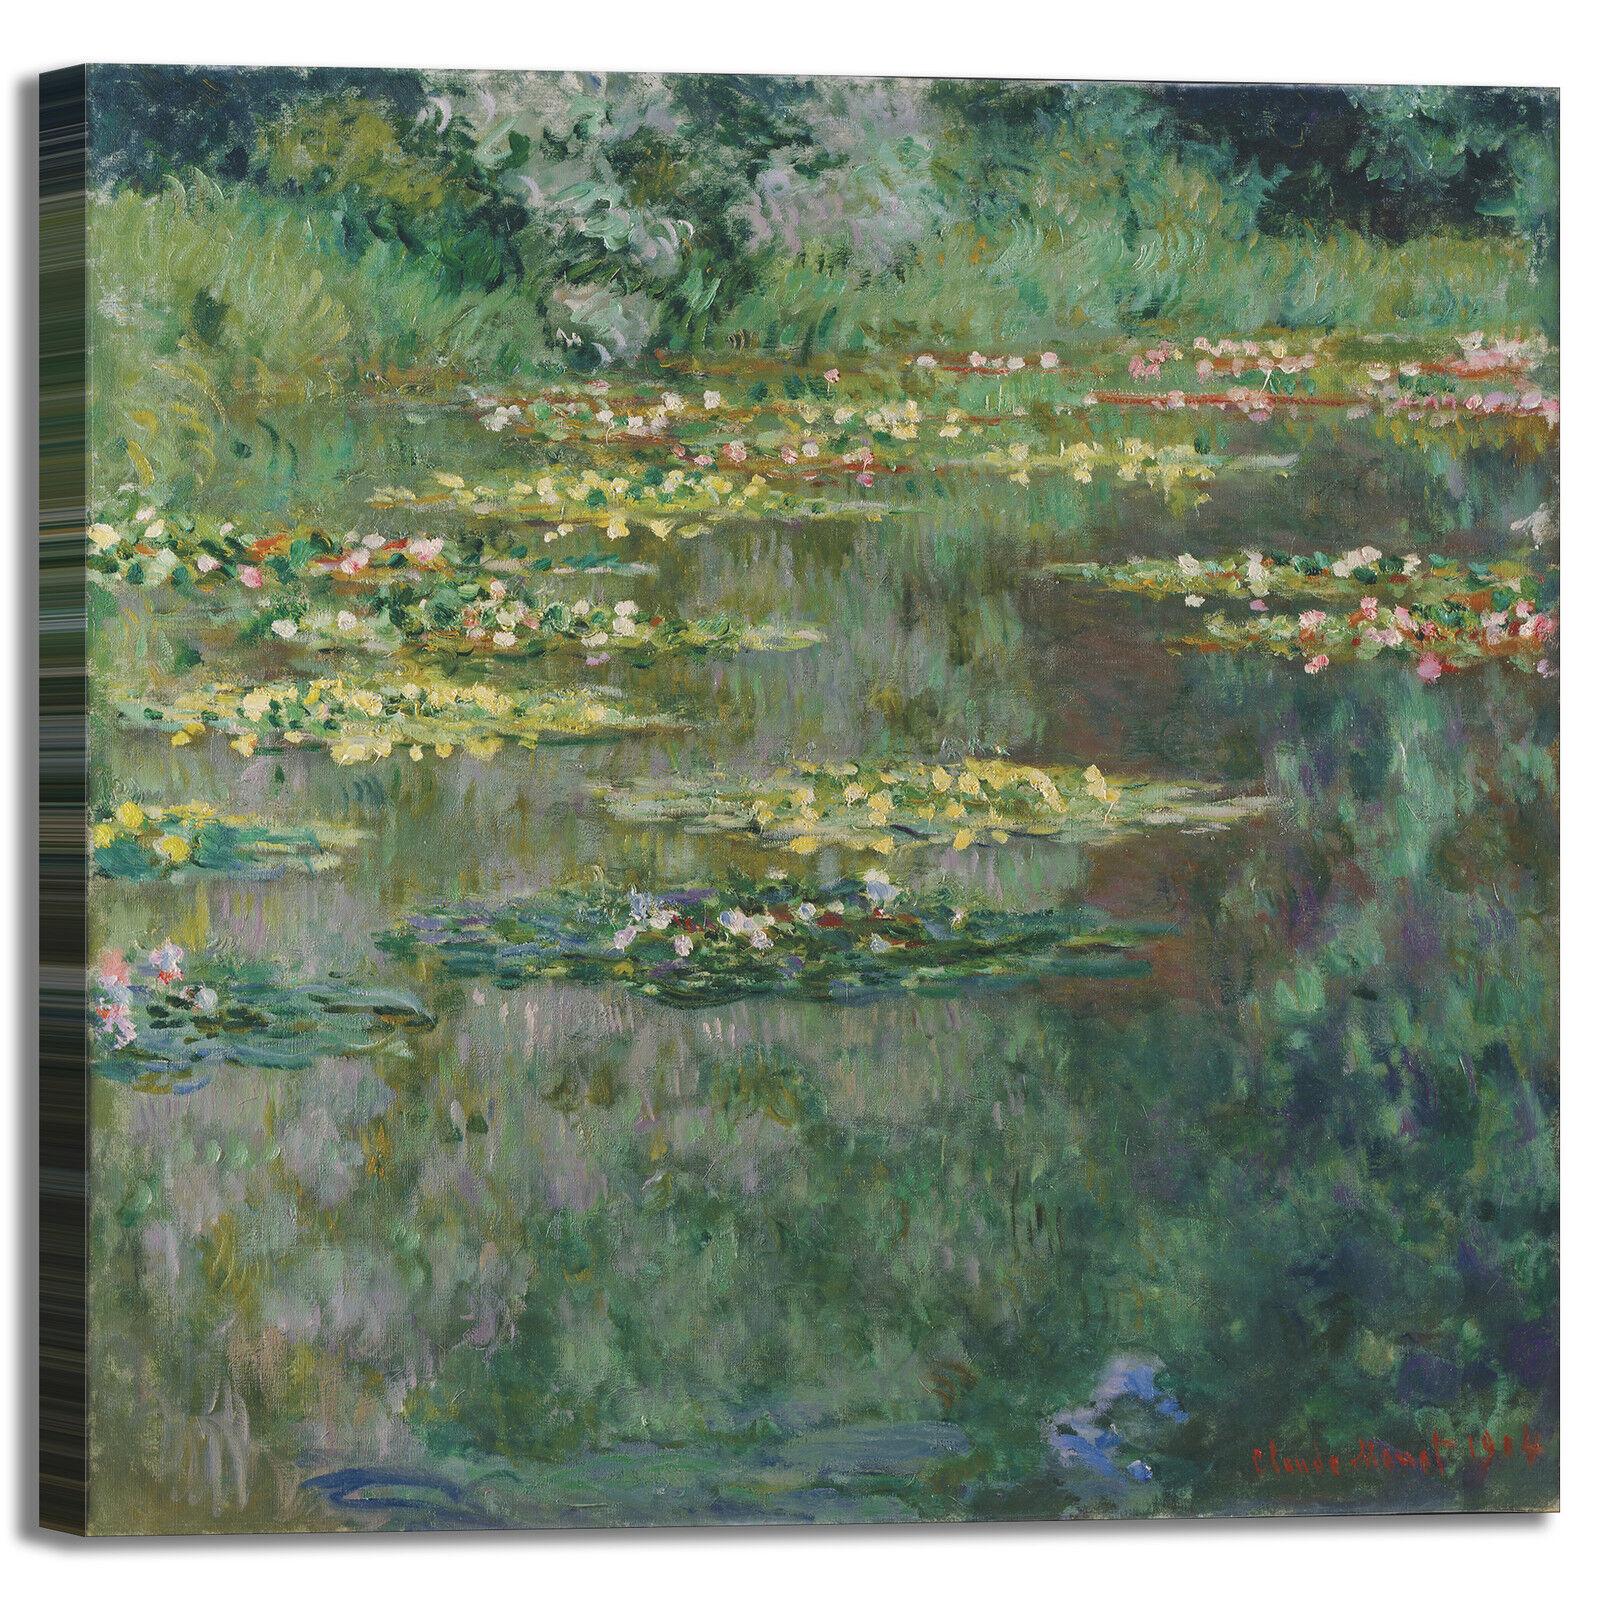 Monet ninfee 67 design quadro stampa tela dipinto telaio arroto casa